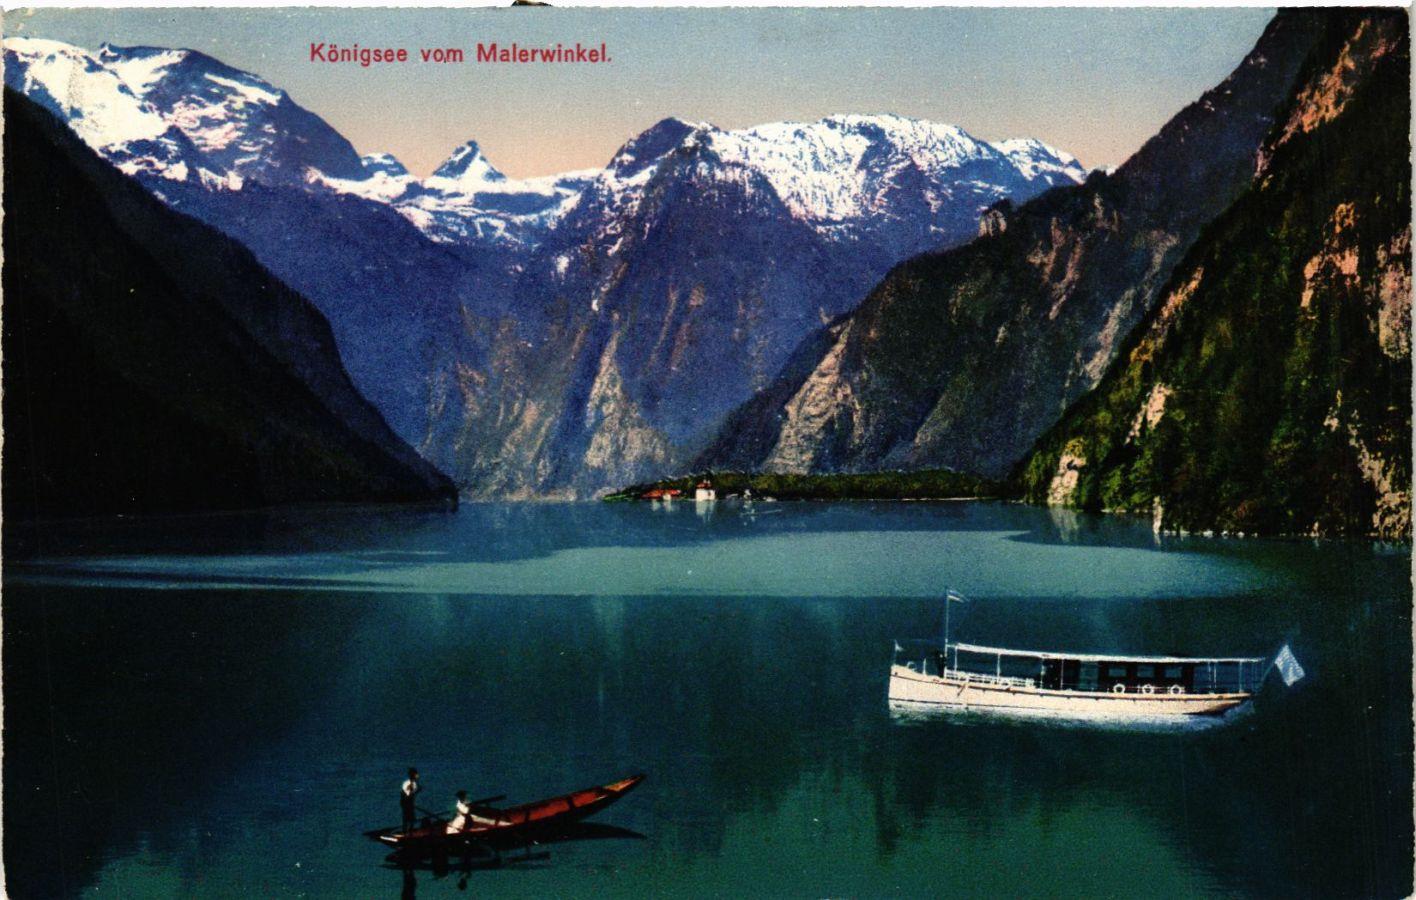 CPA-AK-Konigssee-vom-Malerwinkel-GERMANY-878784